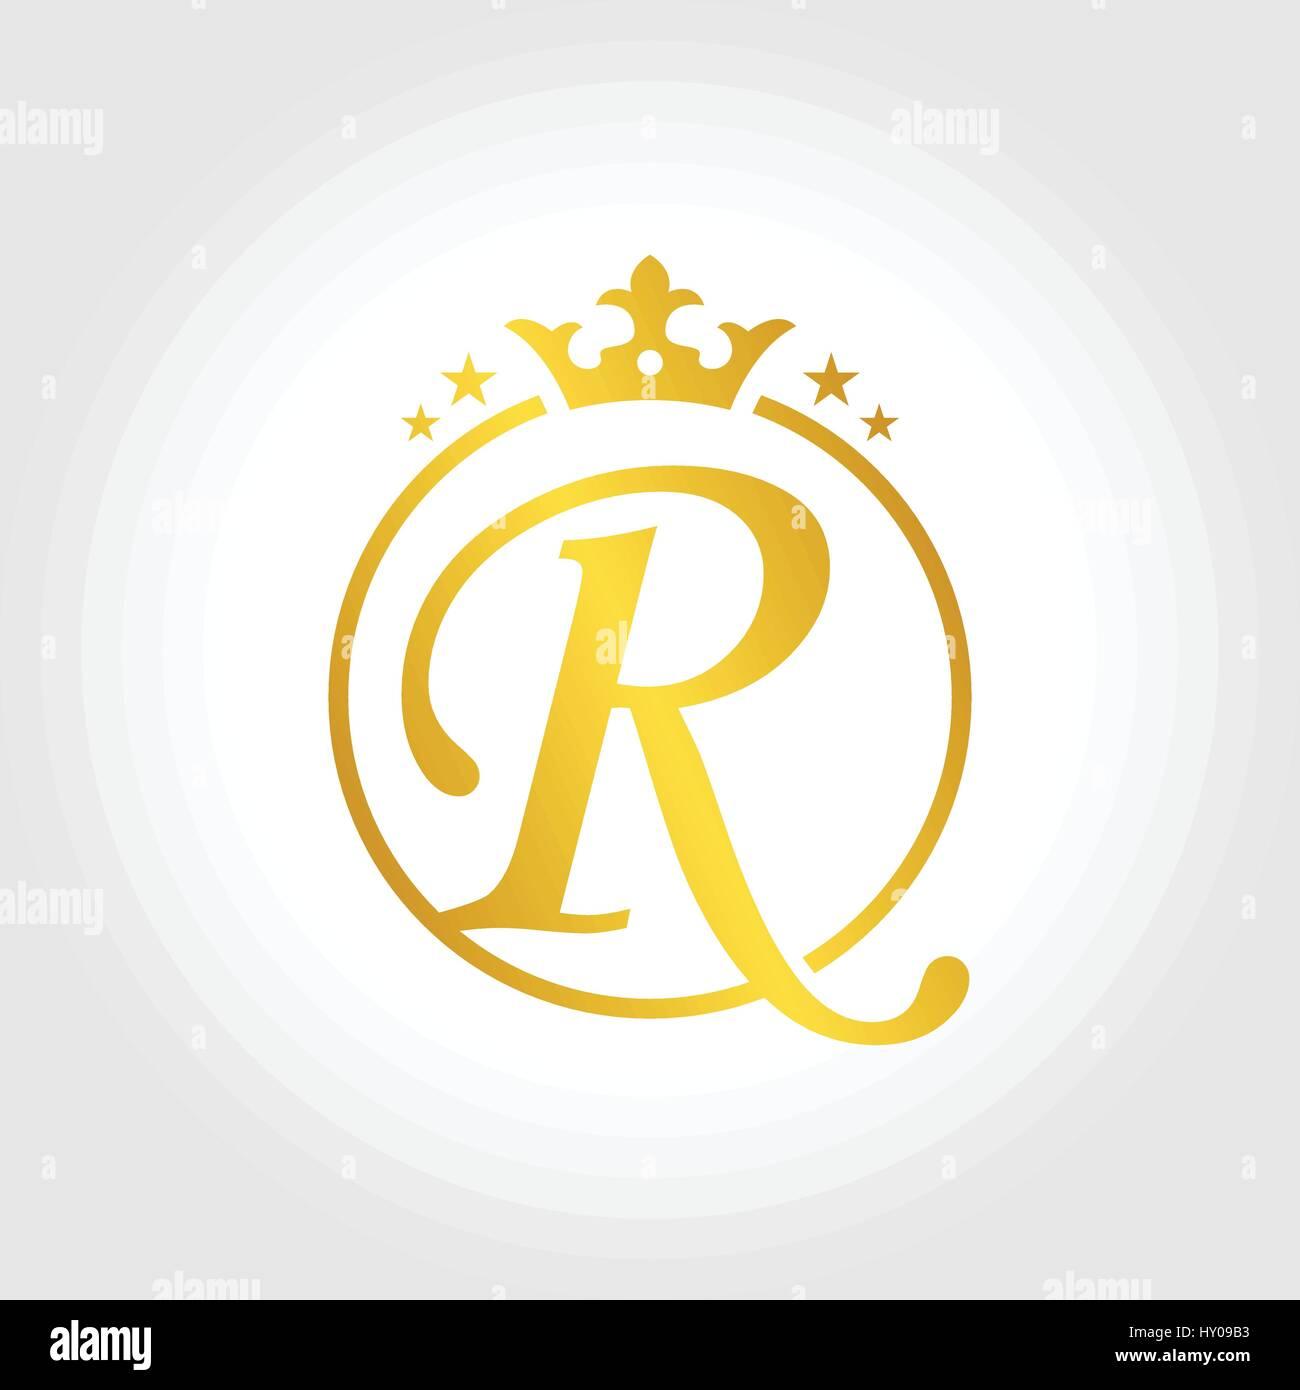 Letter R Initial Inside Circle Symbol Design Stock Vector Art